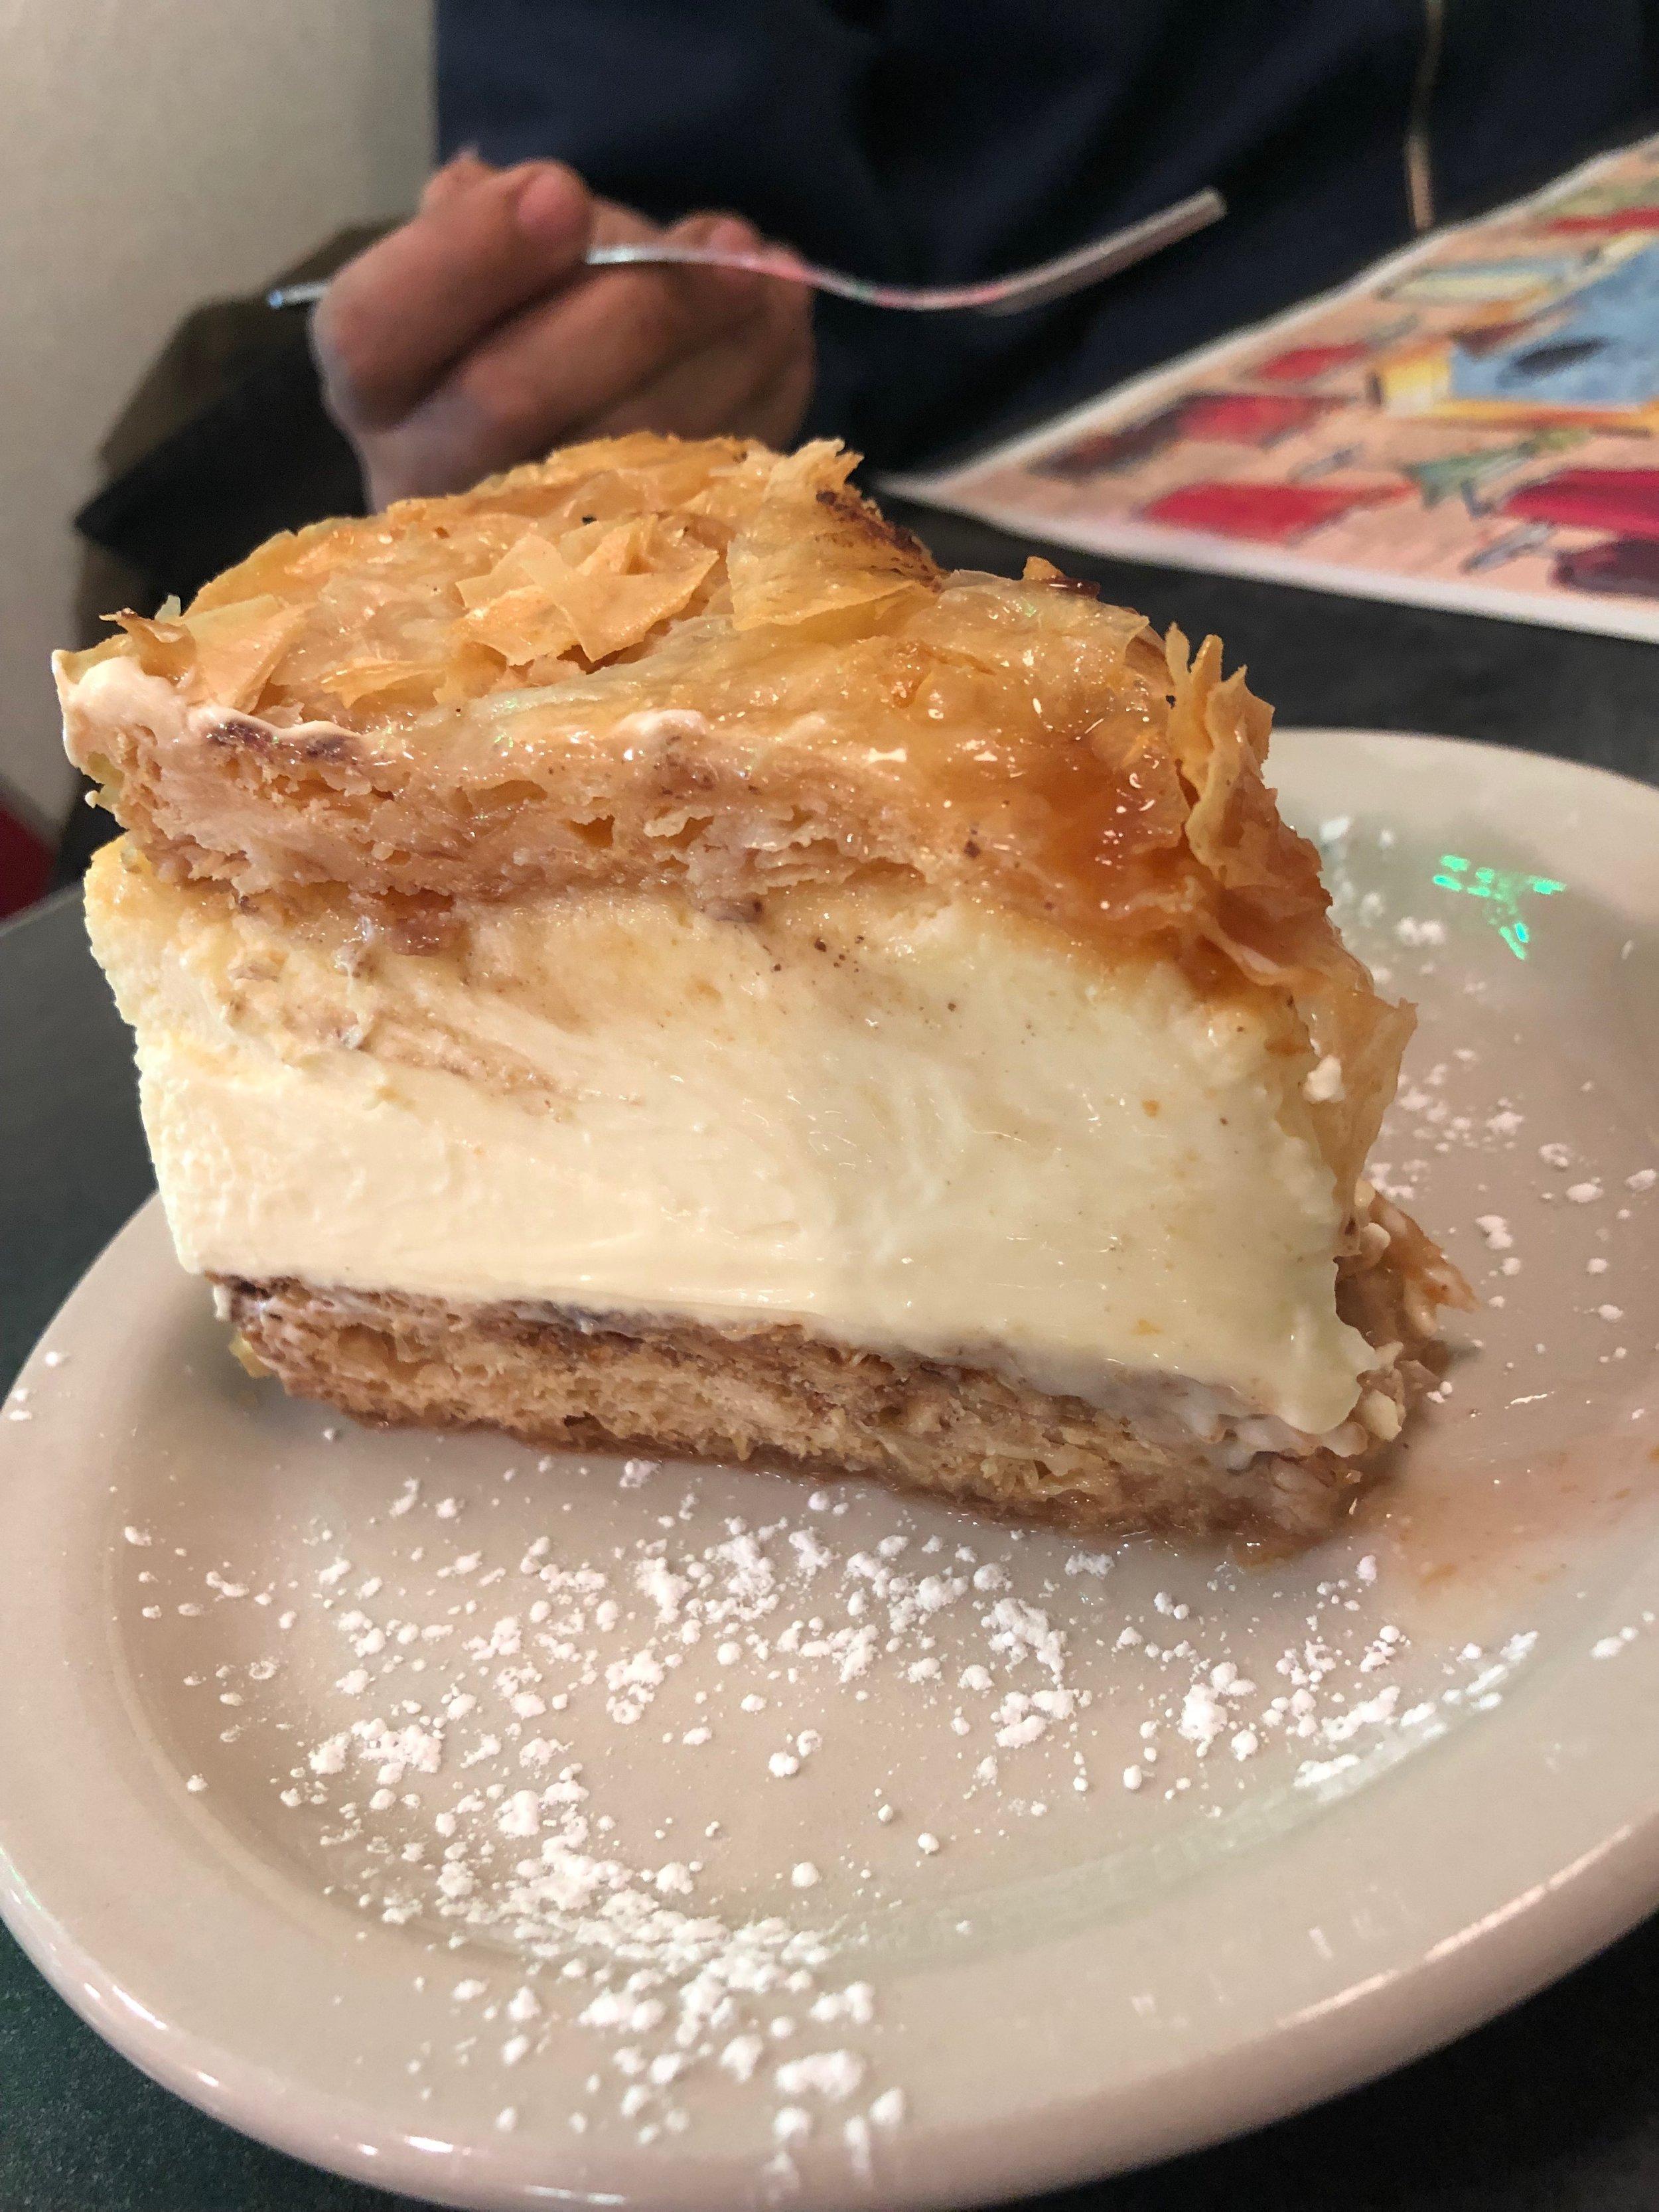 It's baklava. It's cheesecake. God damn - it's baklava cheesecake.